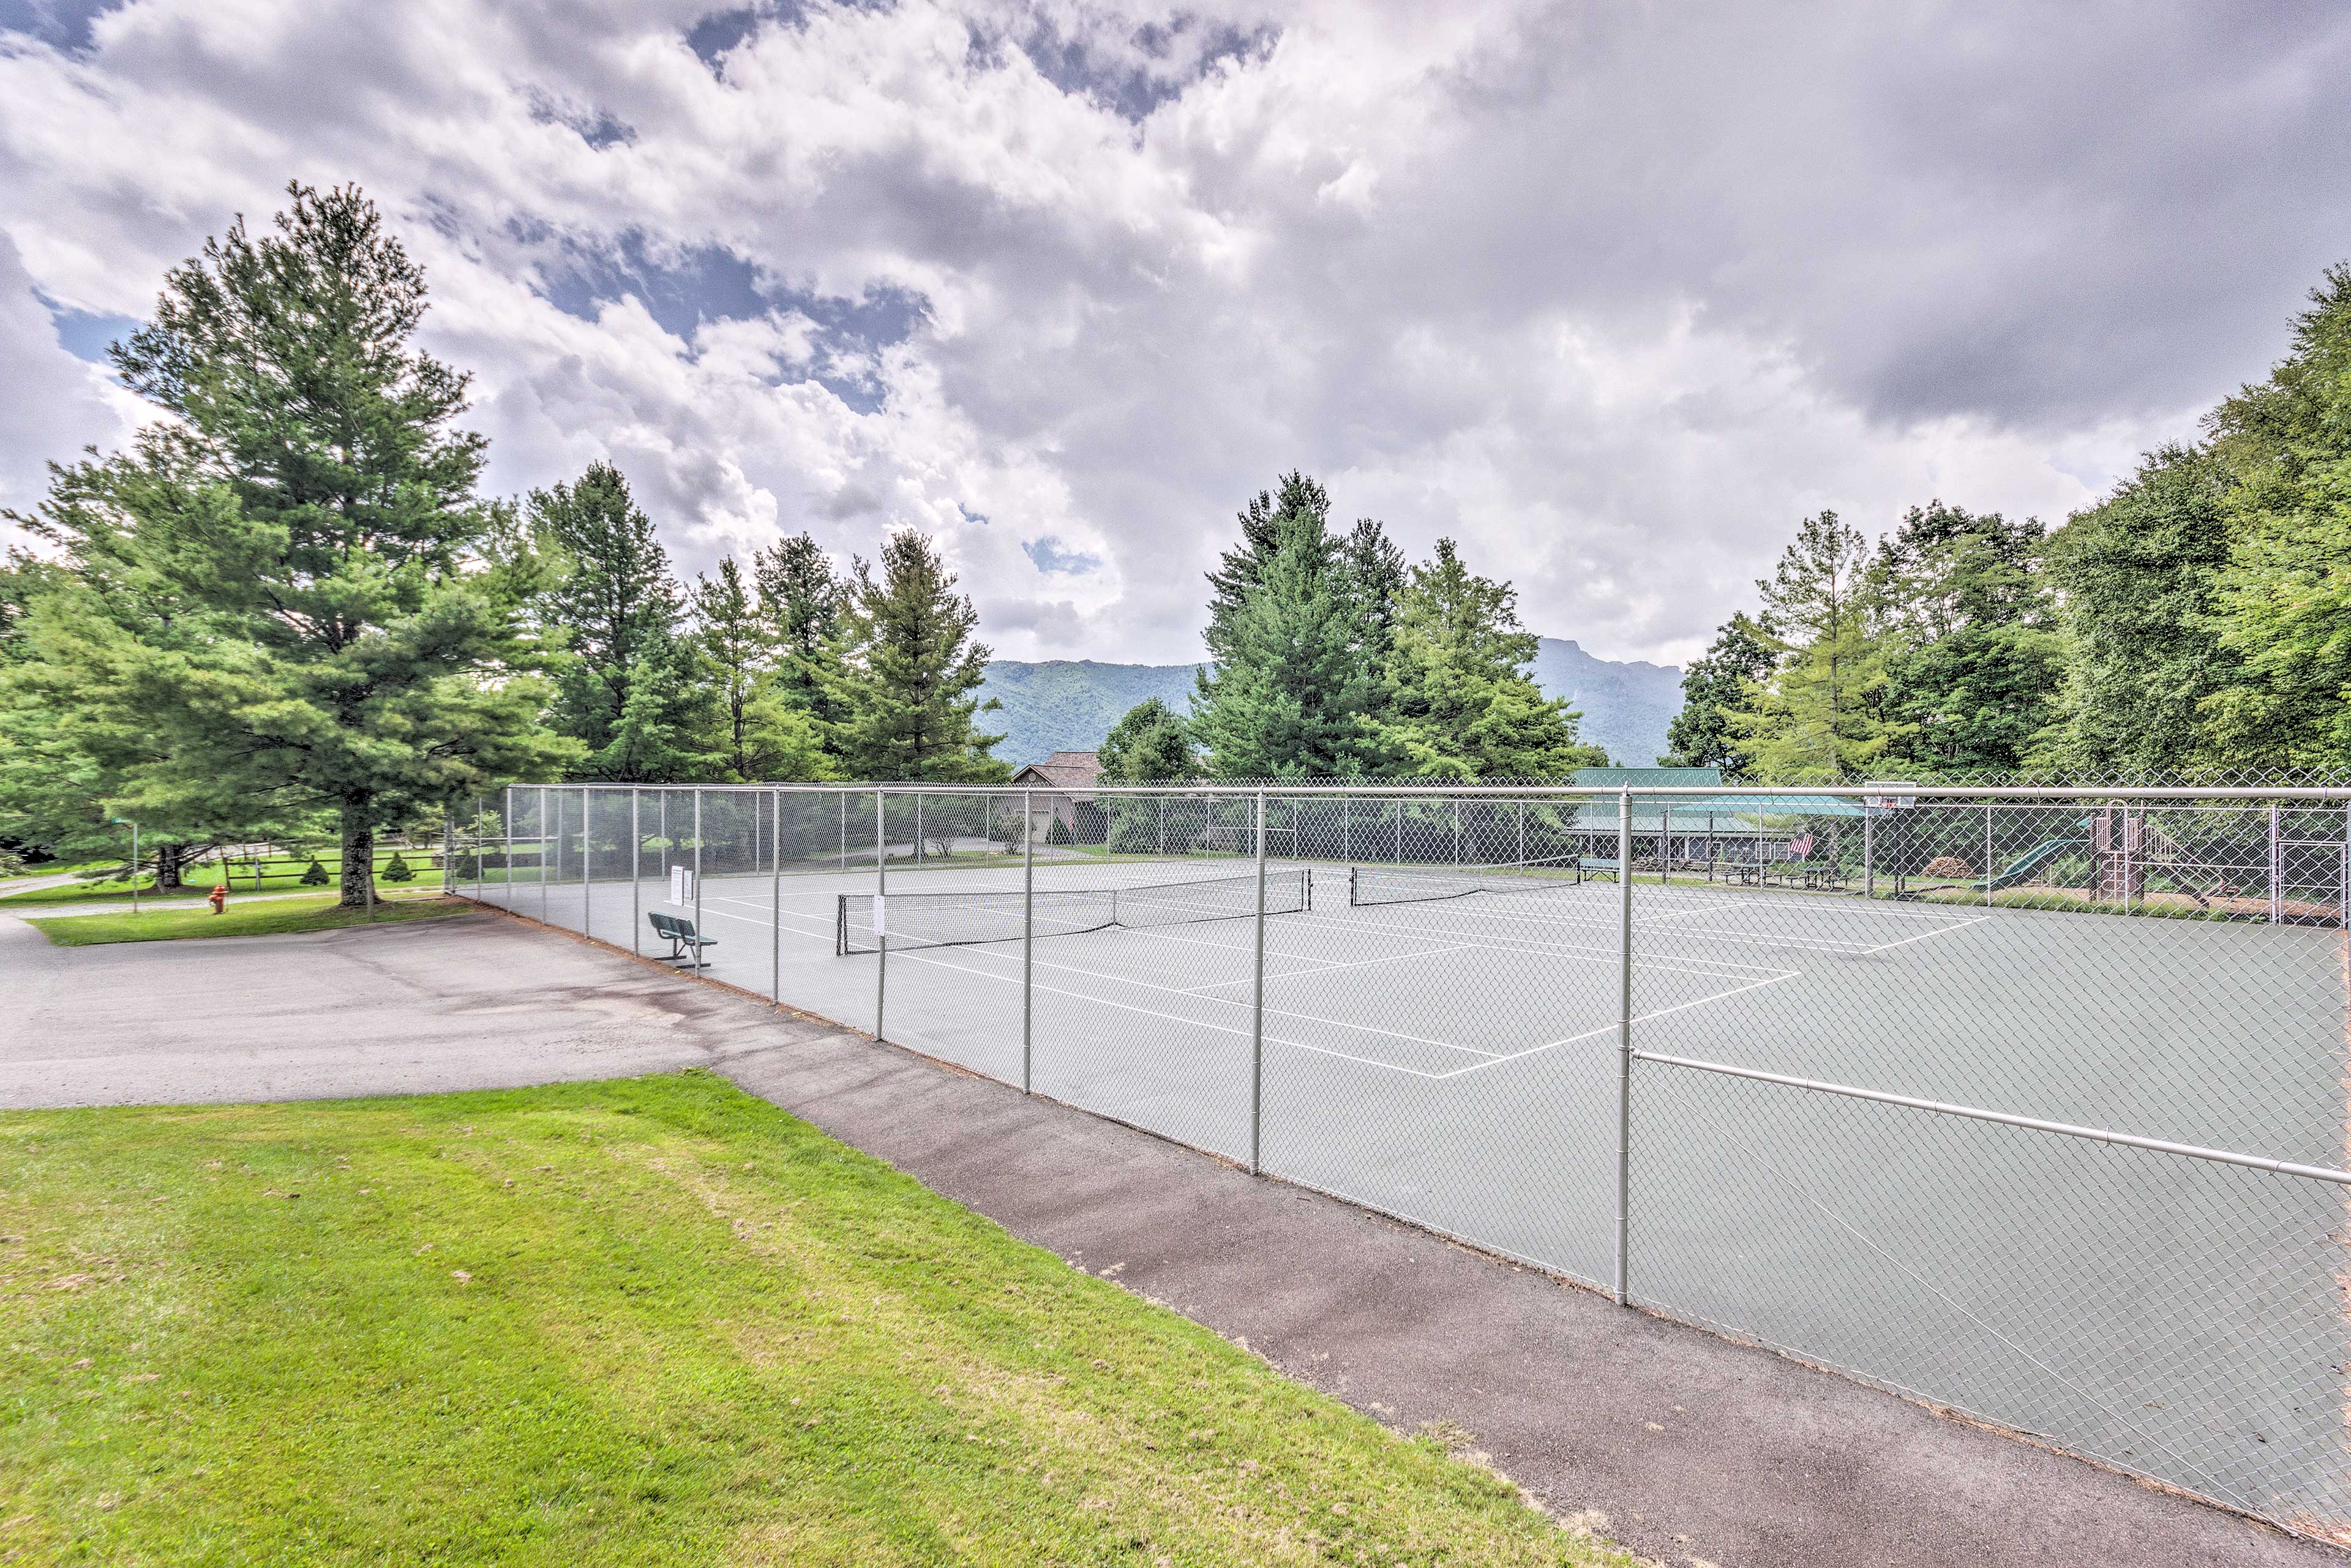 Hawks Peak South Community   Tennis Courts